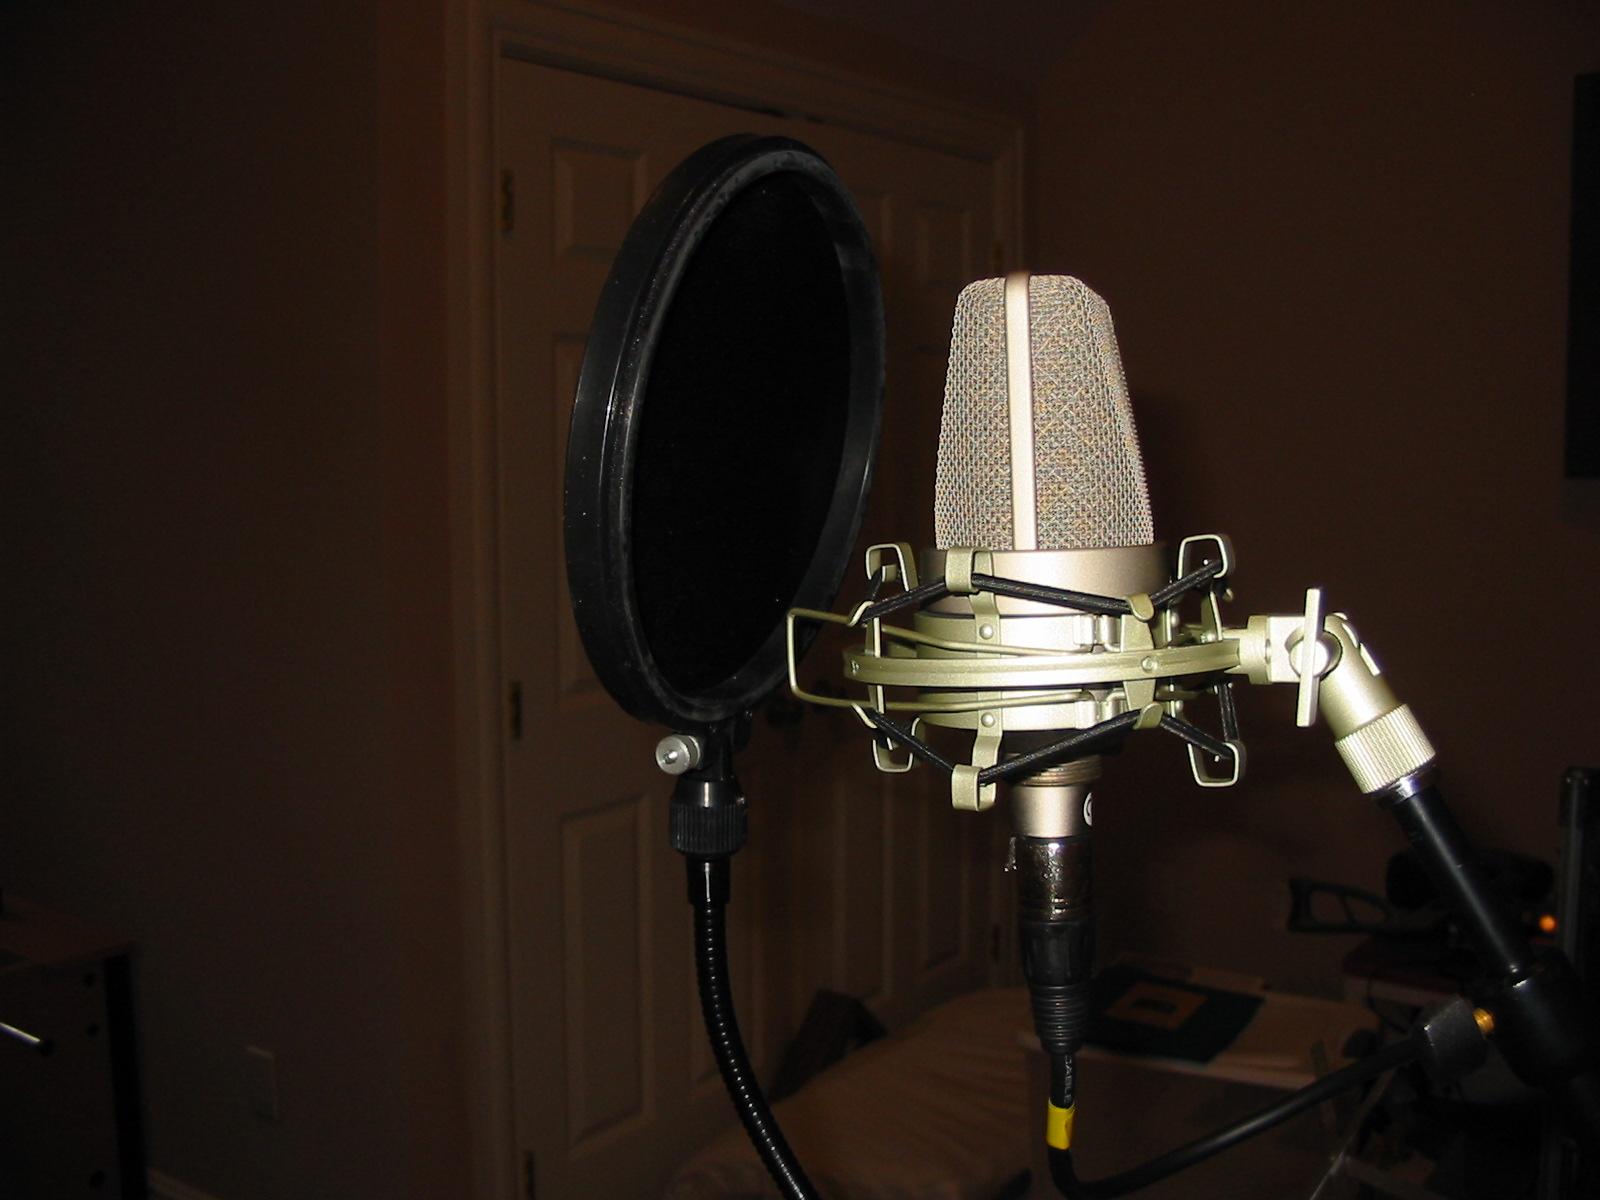 Audio post production studios in bangalore dating 6